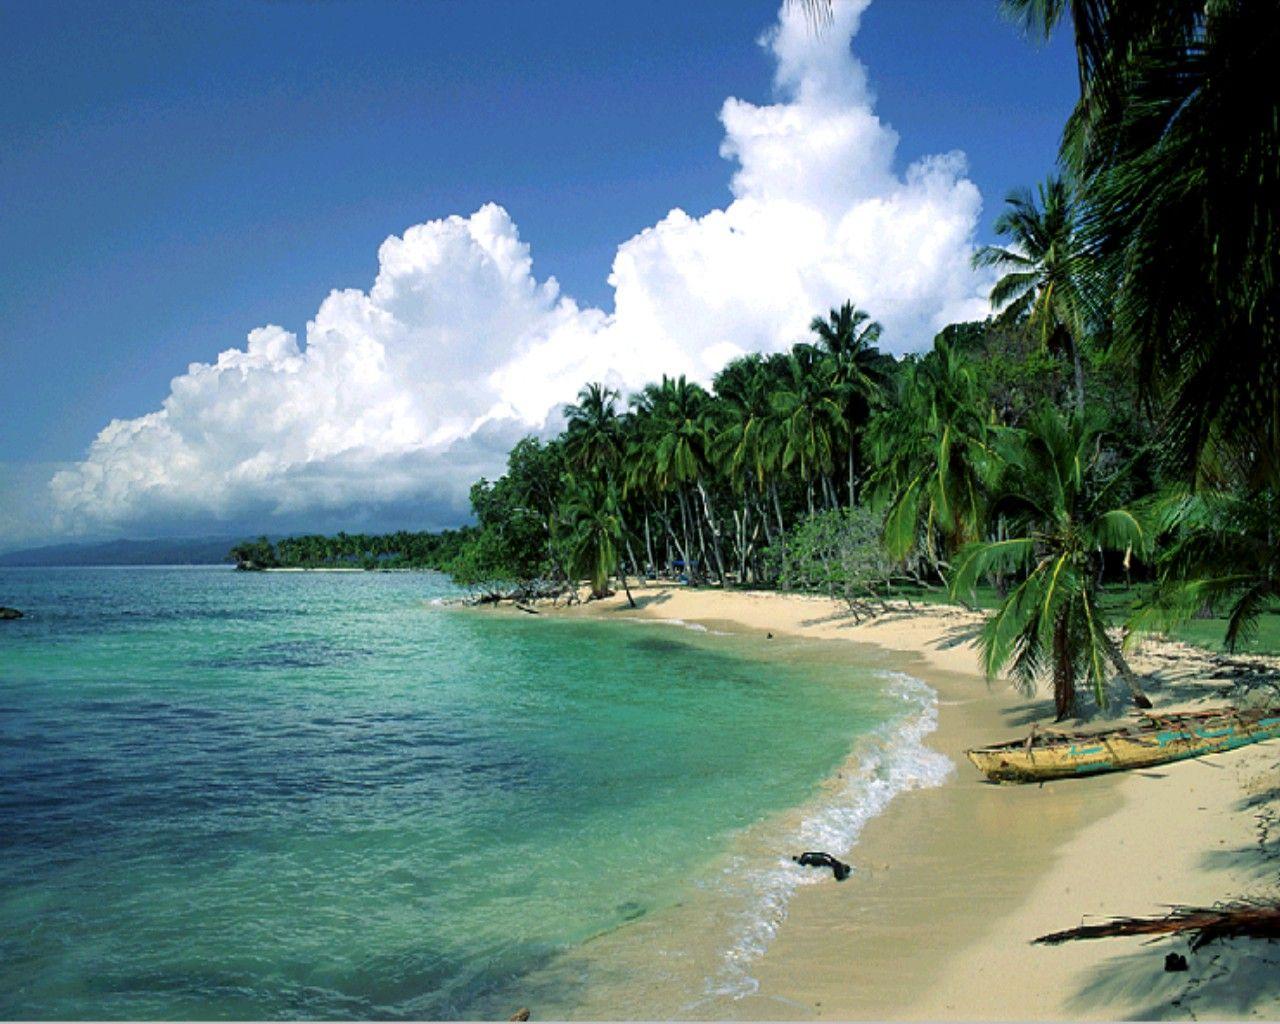 Hd Landscape Backgrounds Best Hd Wallpapers Beach Landscape Nature Beach Beautiful Beaches